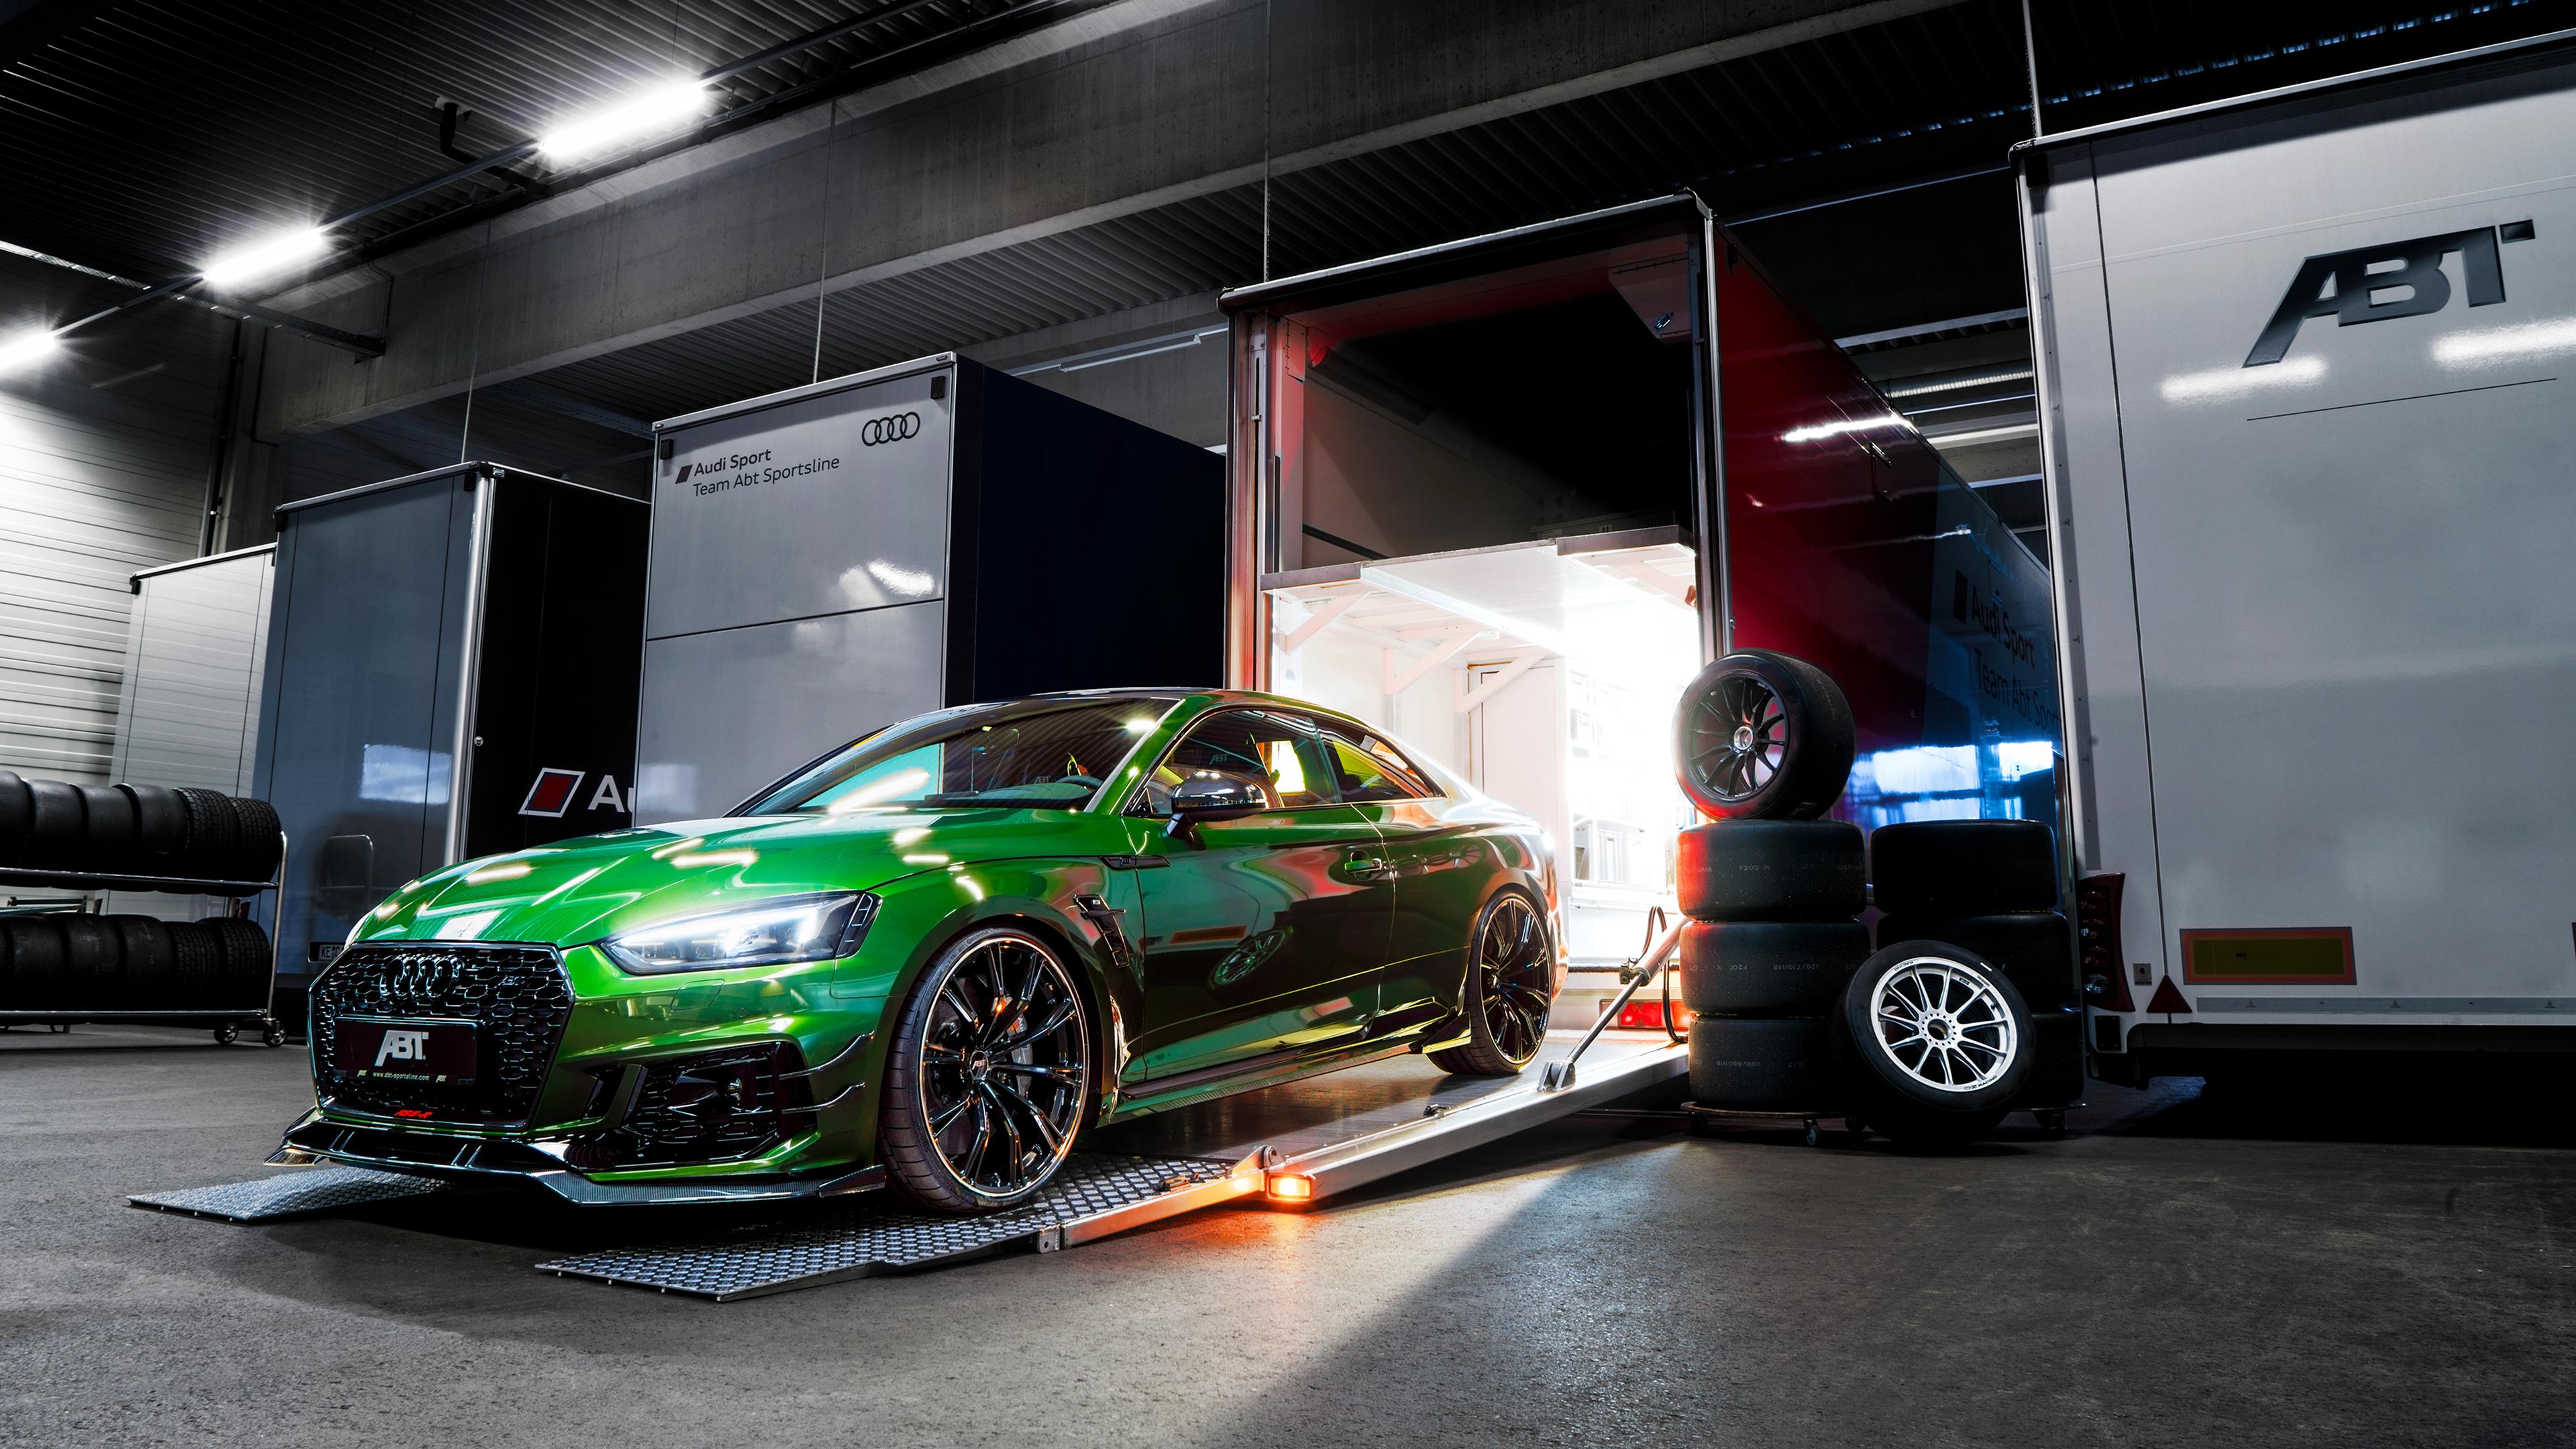 2018 ABT Audi RS 5 R Coupe 4K Wallpaper   HD Car ...